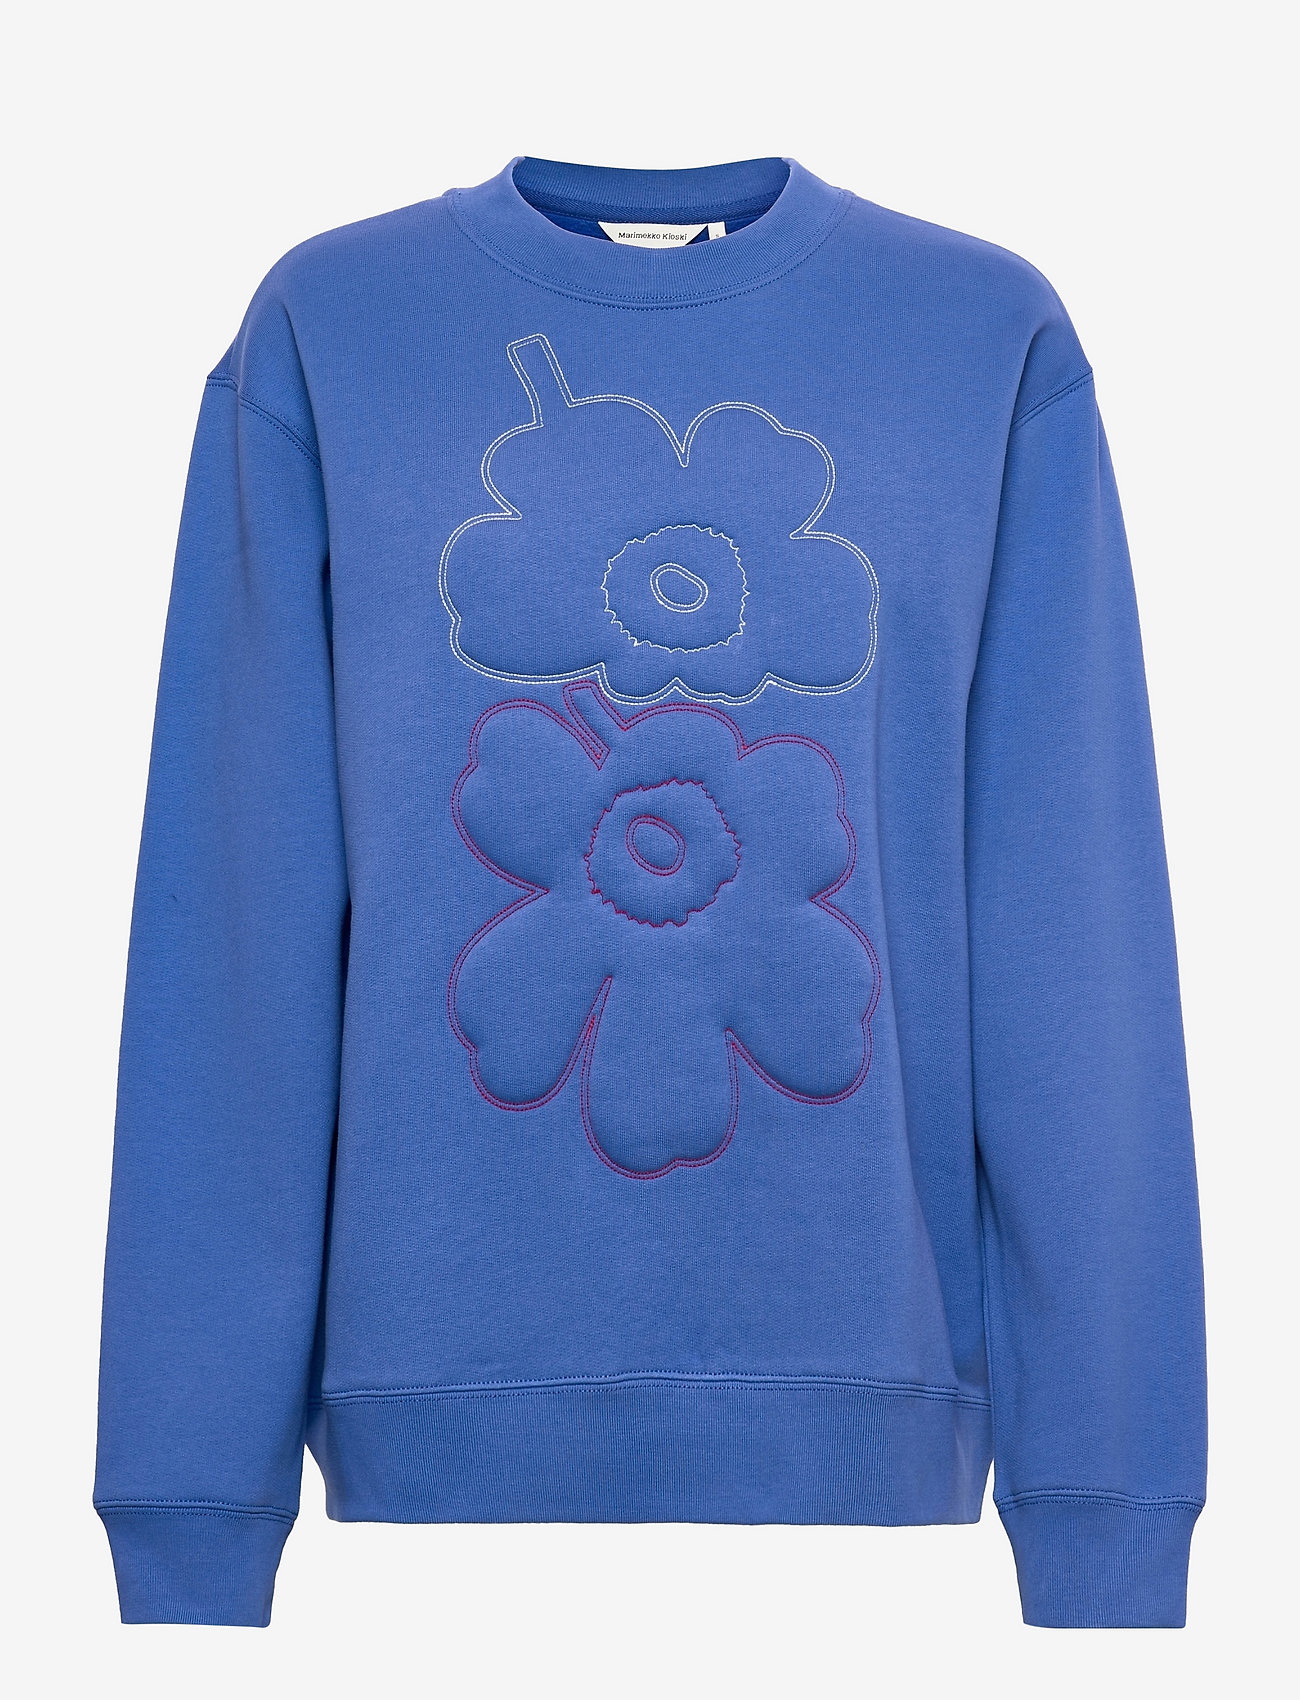 Marimekko - HUIPENNUSTA UNIKKO SWEATSHIRT - sweatshirts - blue, multicolored - 0